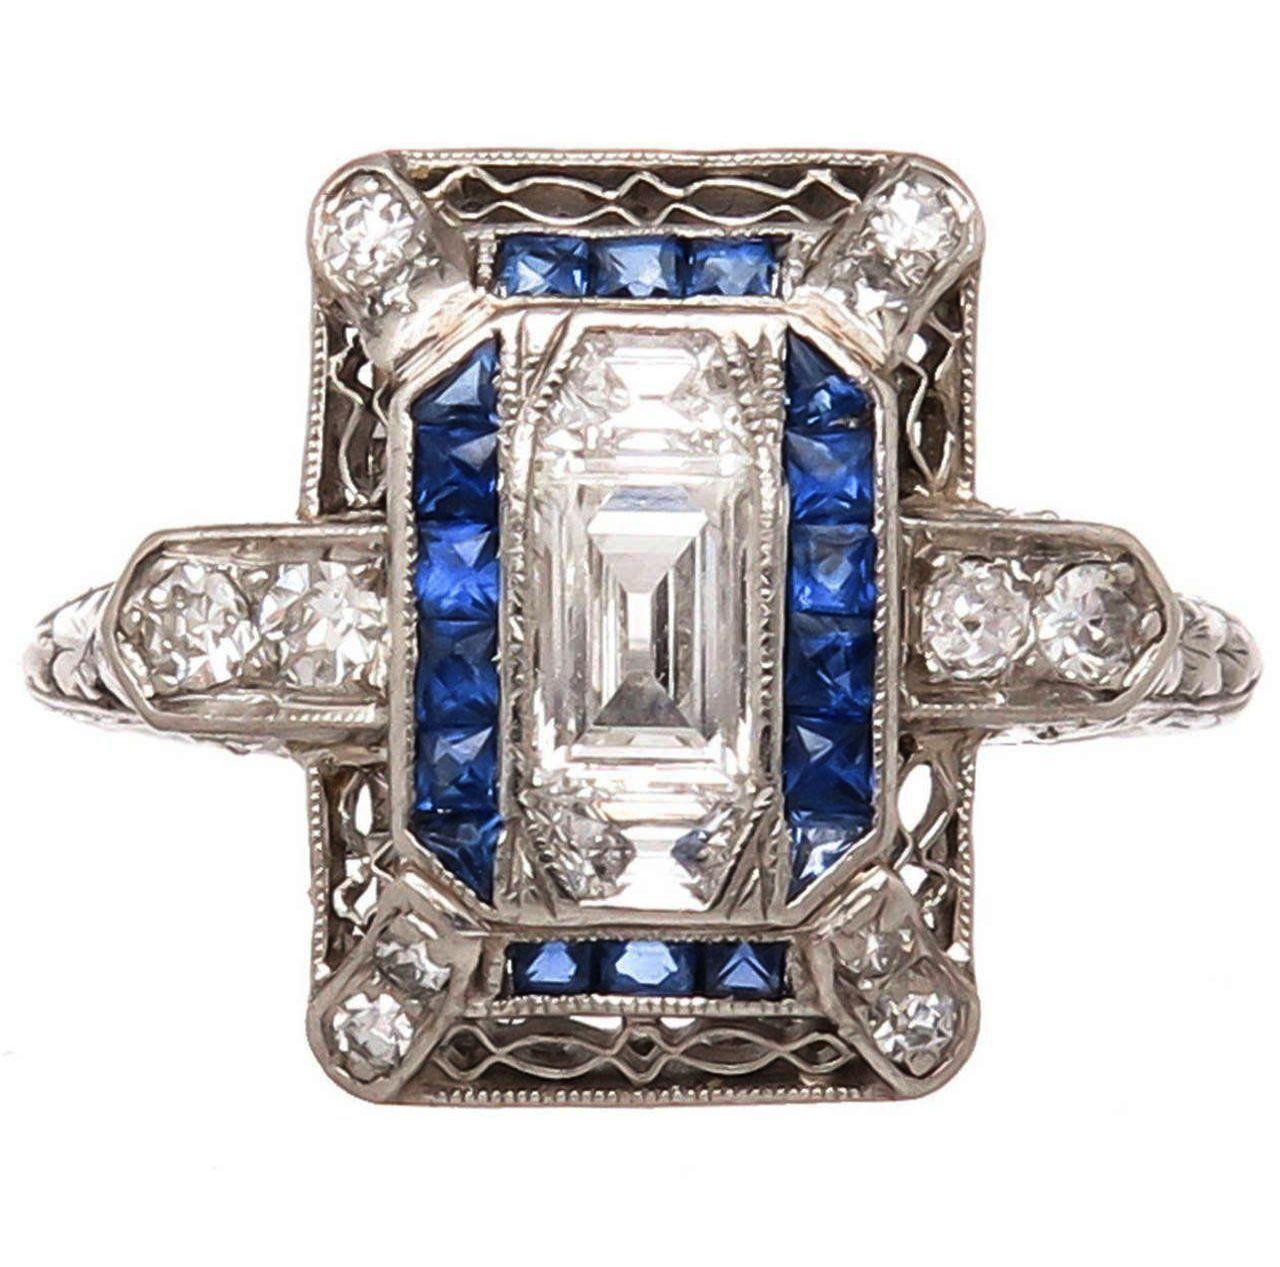 36+ Diamond estate jewelry buyers near me ideas in 2021